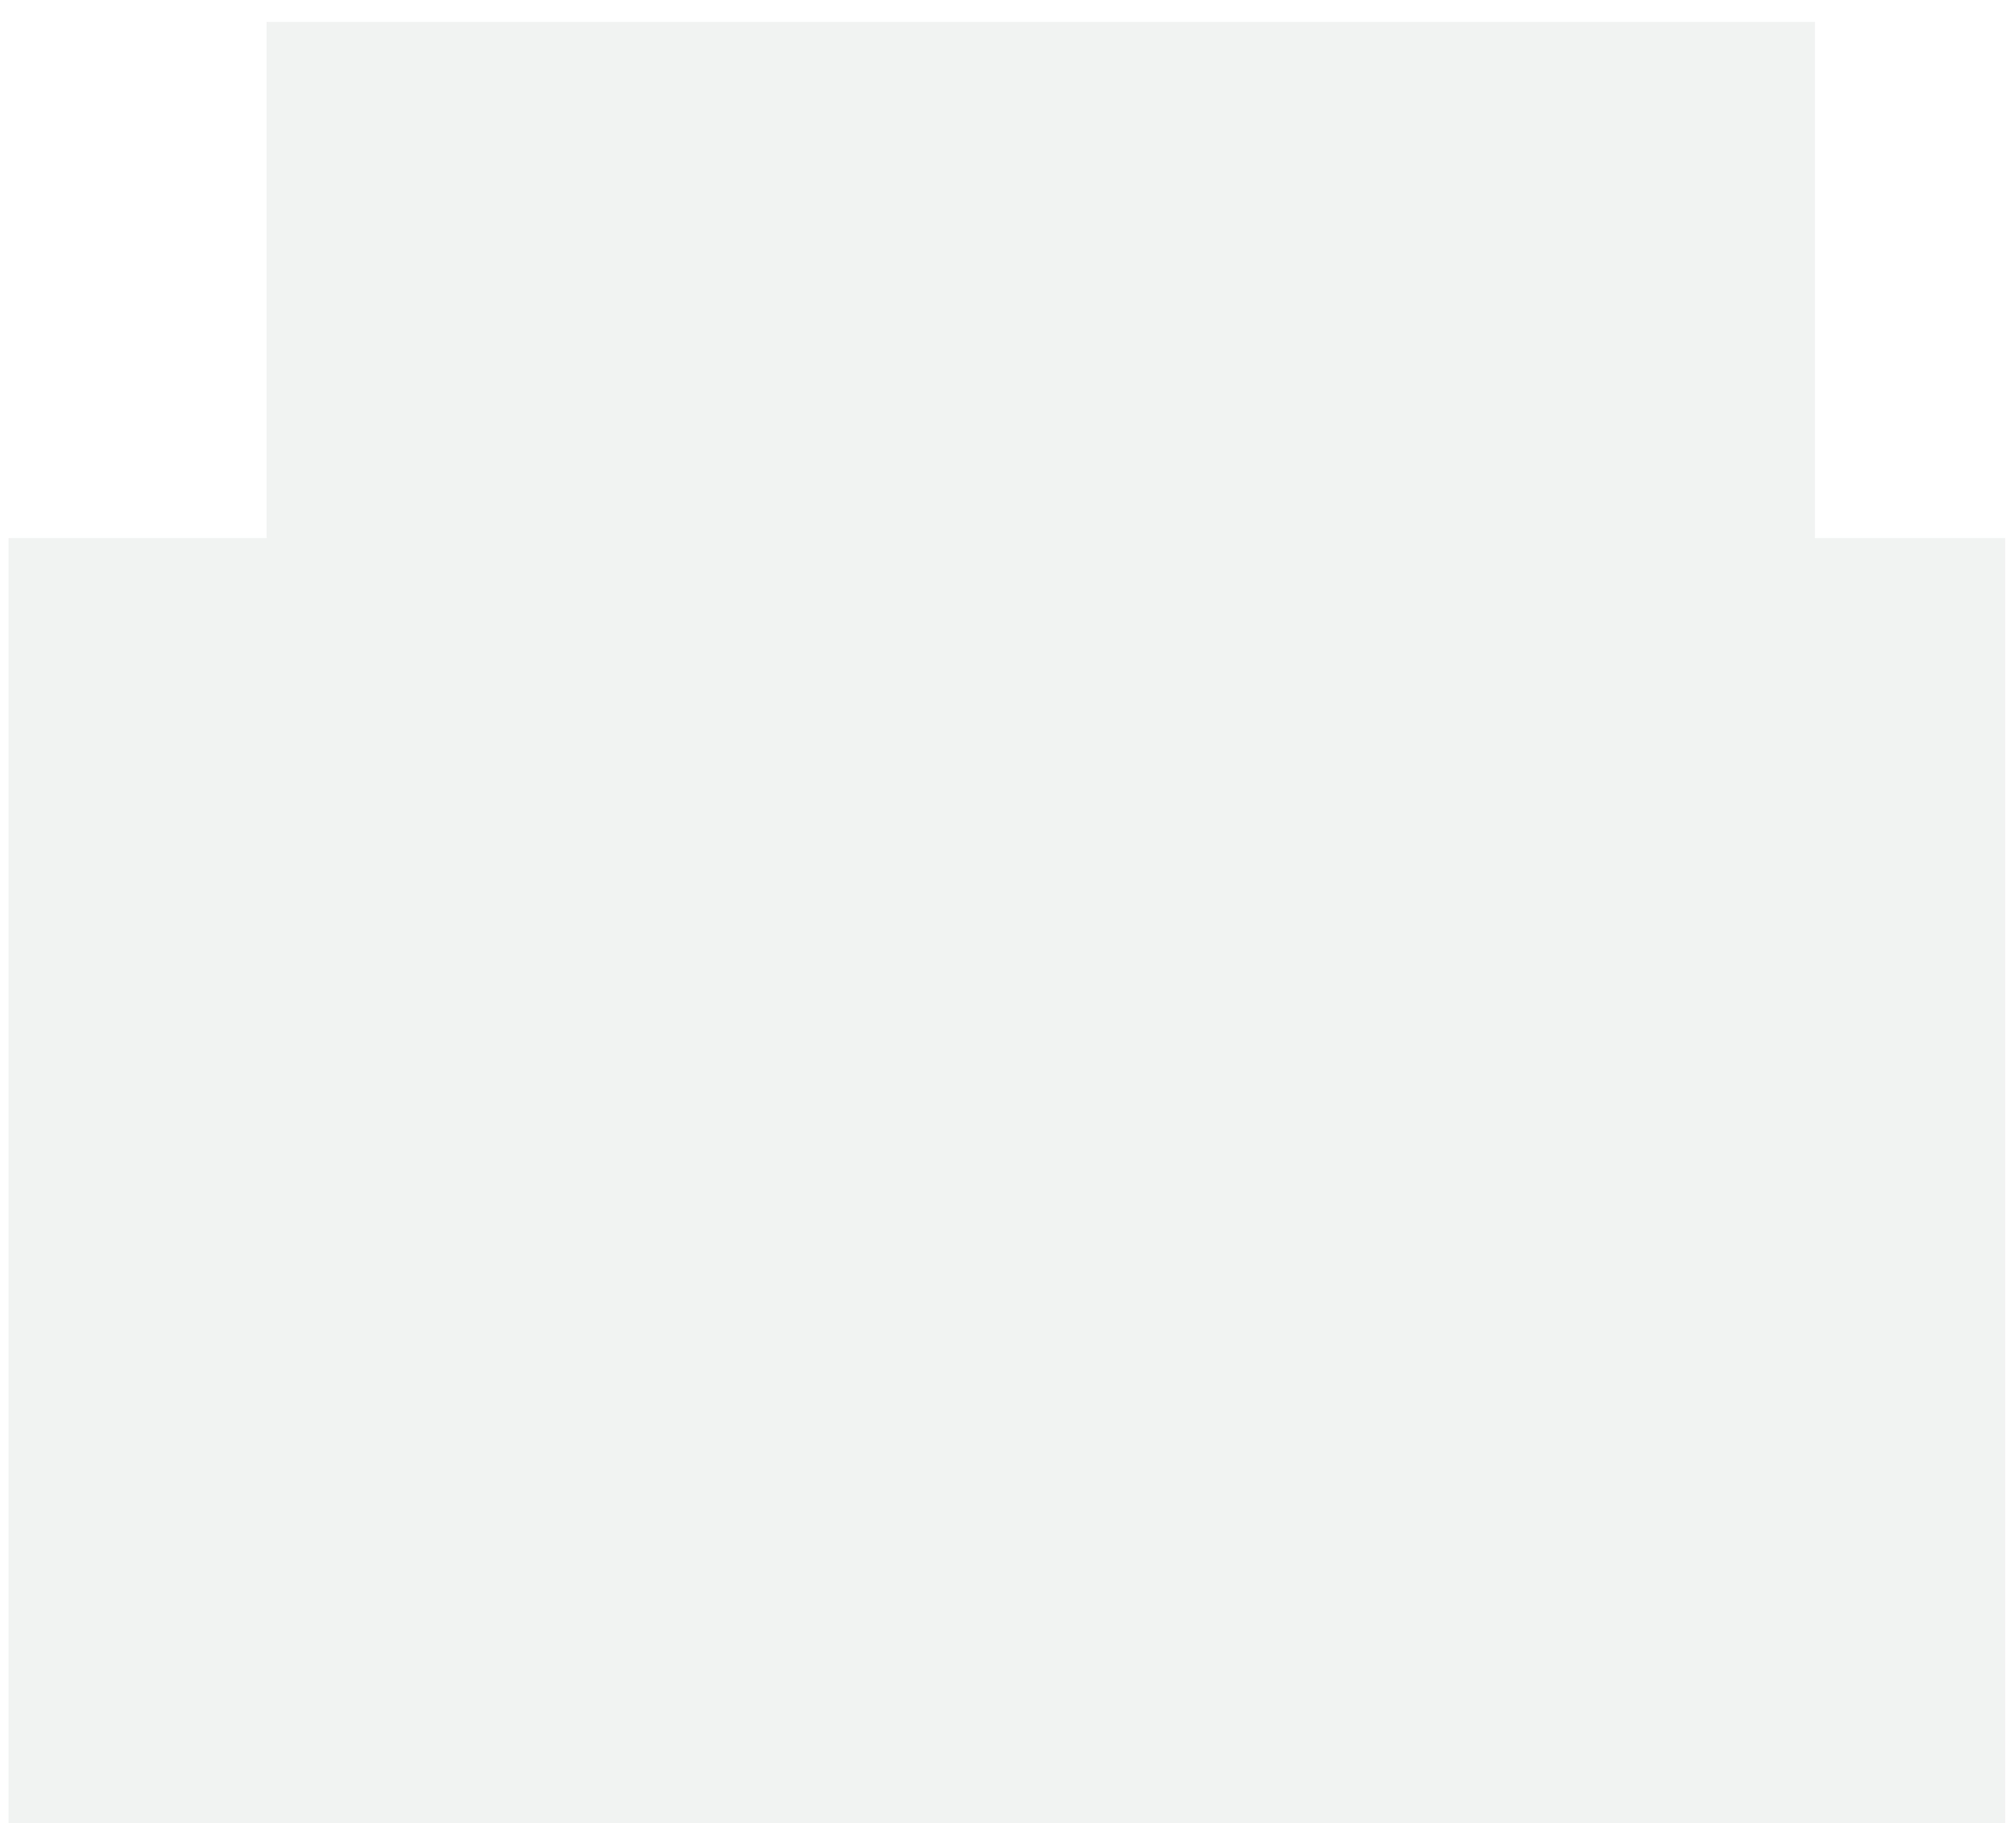 Deer clipart merry christmas. Transparent png clip art